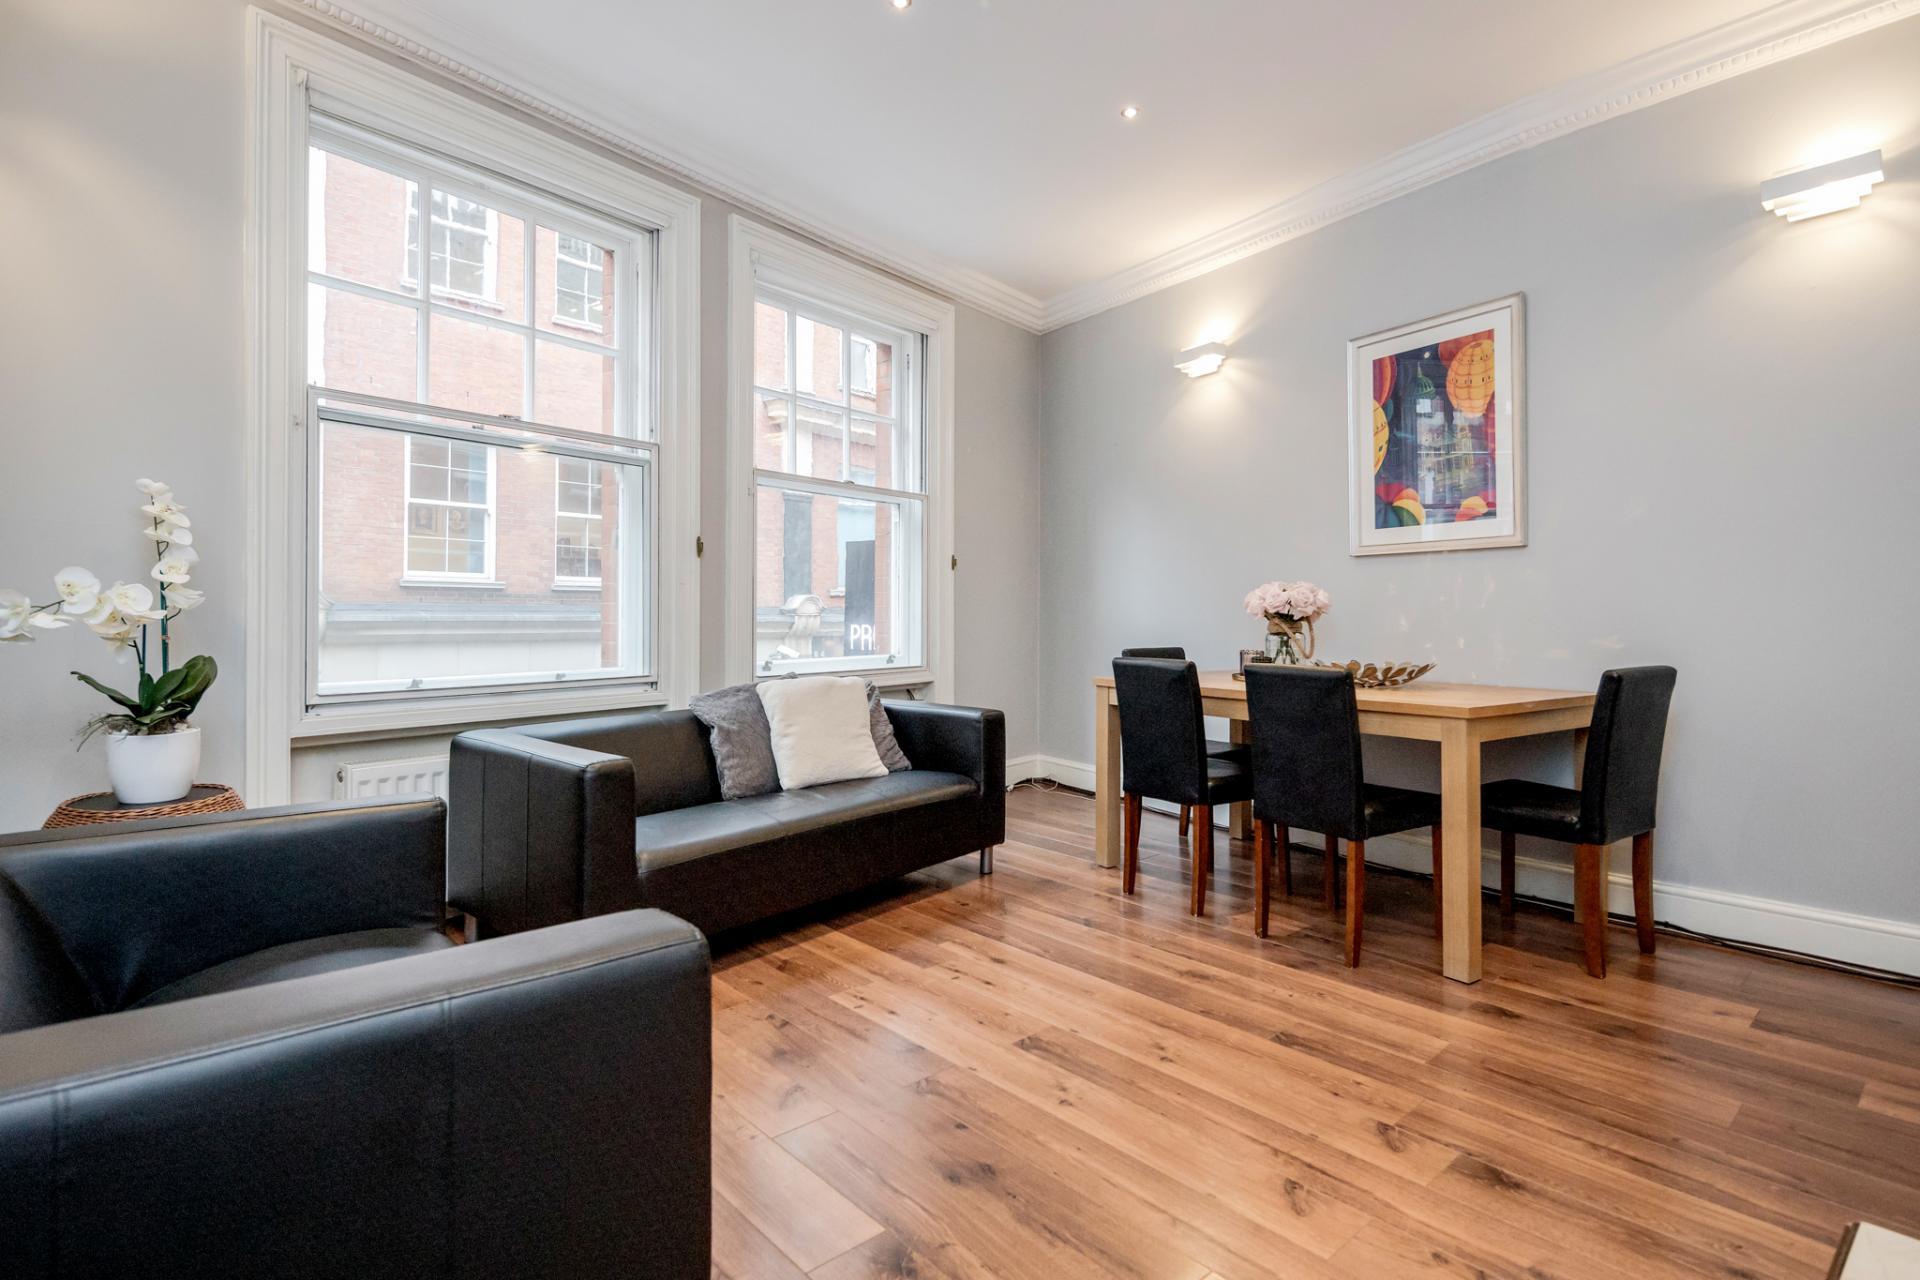 Sofa at Kensington High Street, Kensington, London - Citybase Apartments